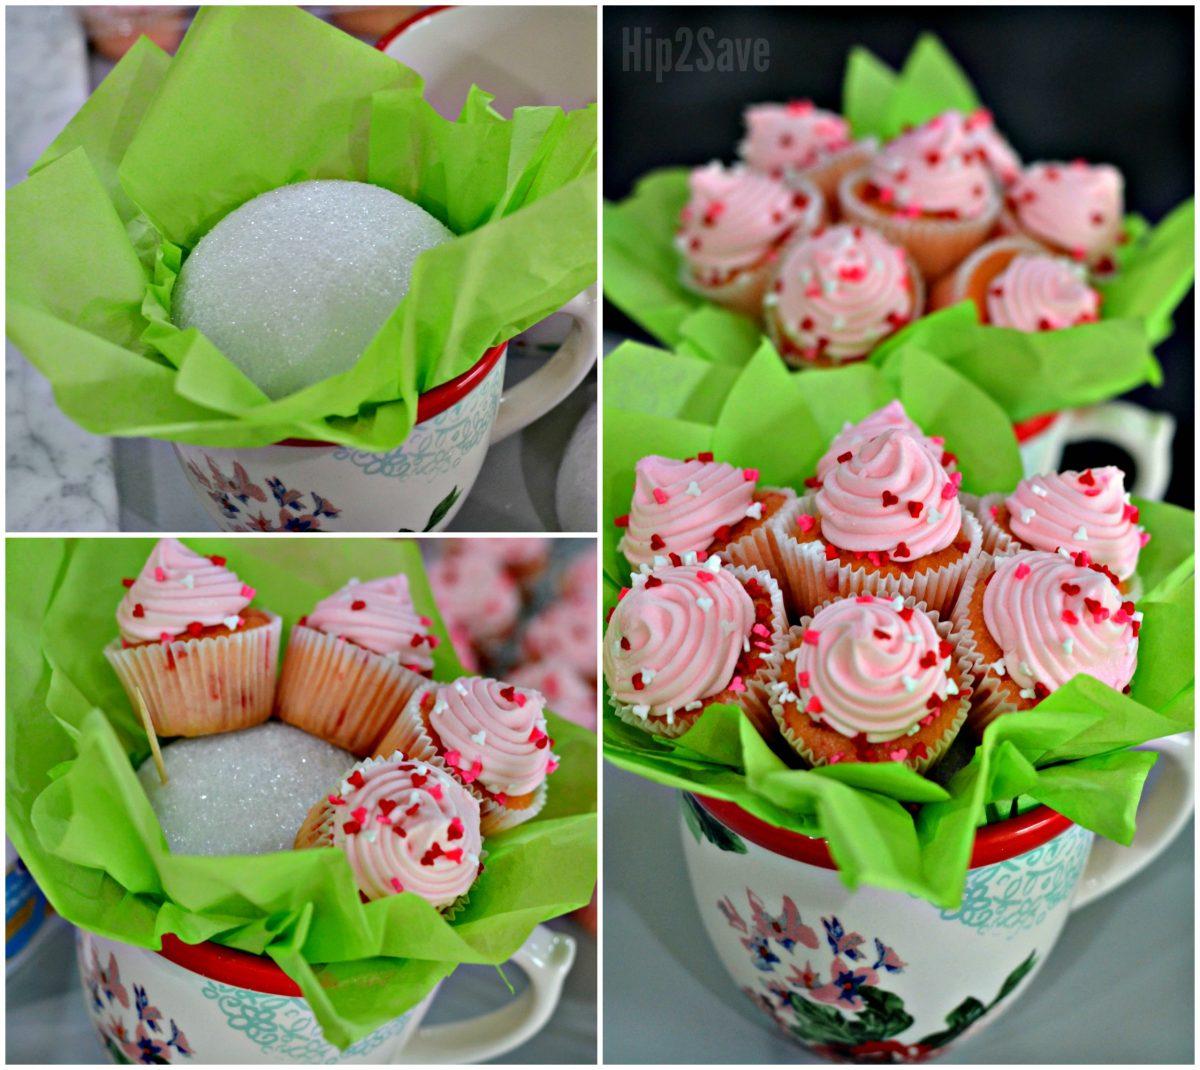 Diy Mini Cupcake Flower Bouquets Fun Unique Gift Idea Hip2save